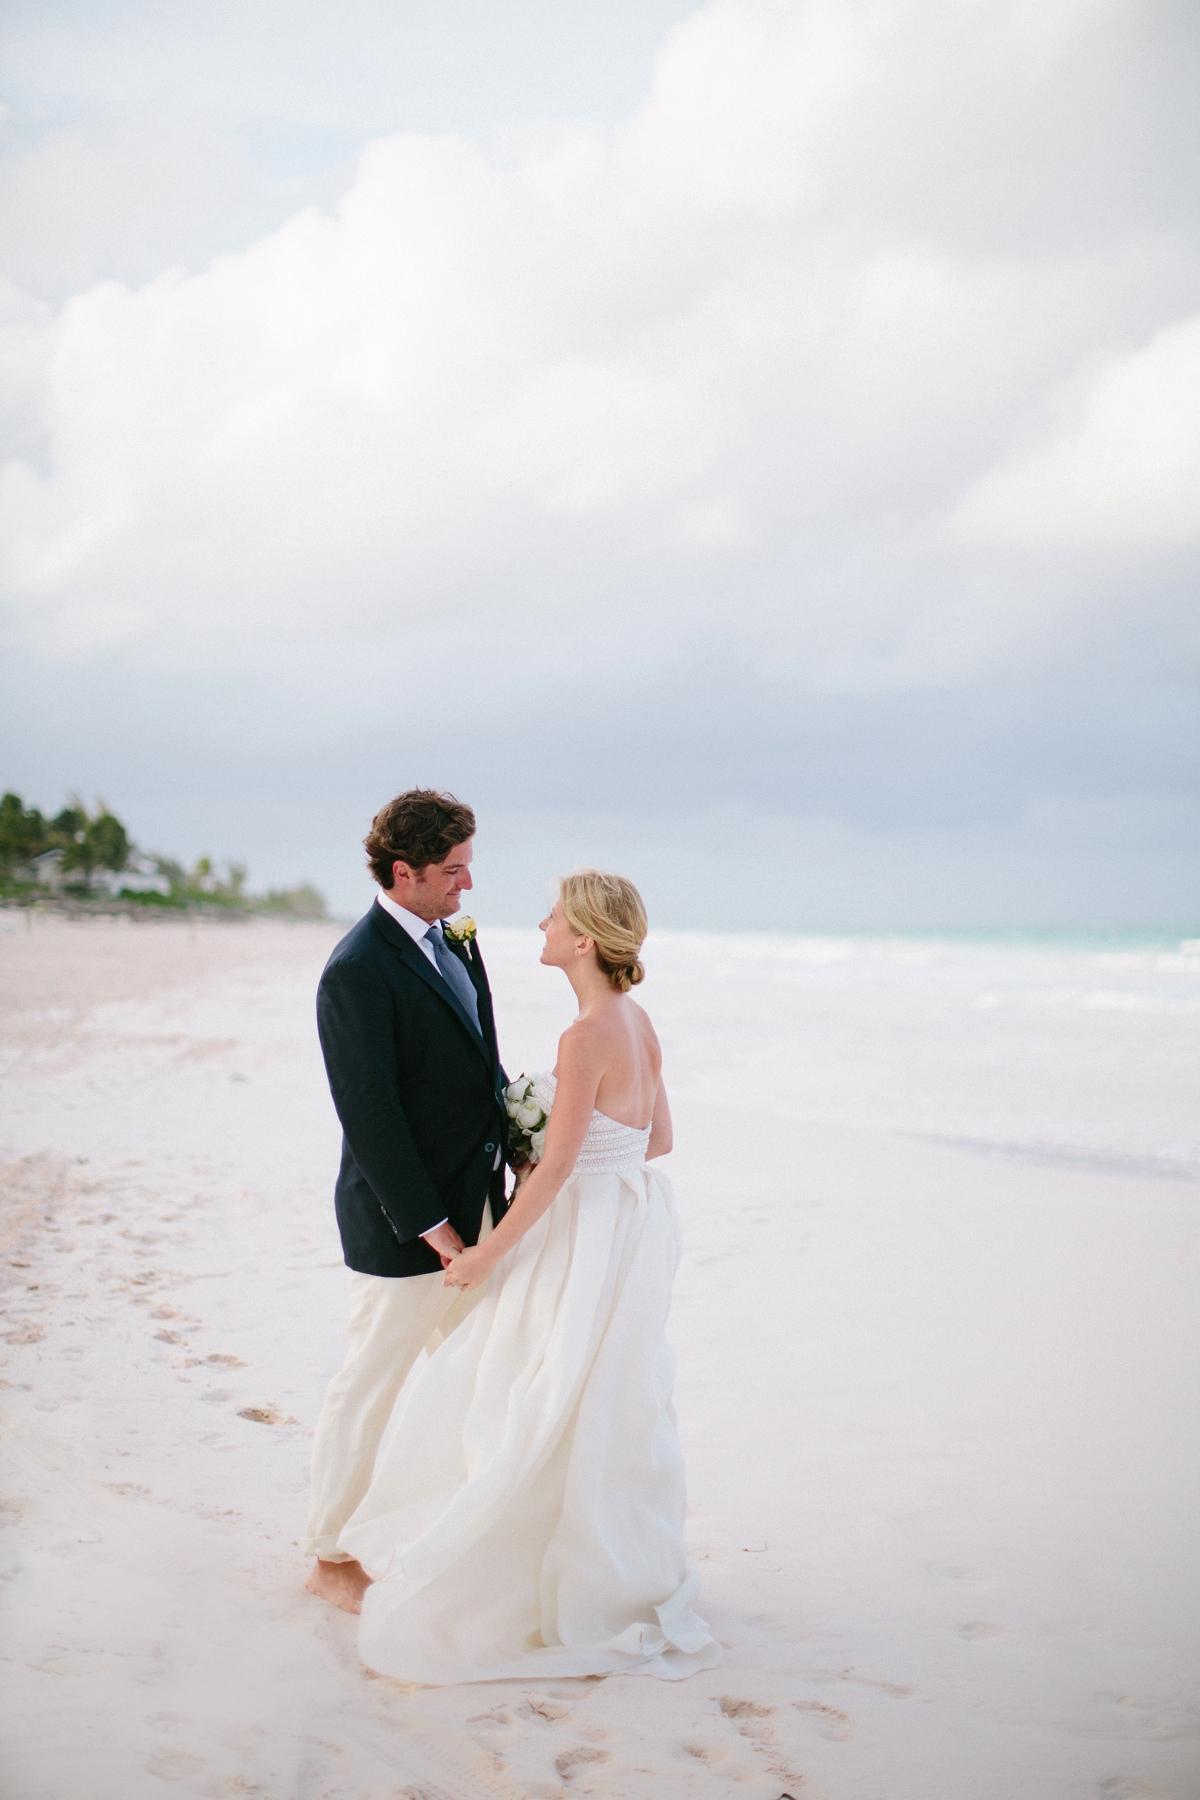 harbour_island-wedding-photographer-briland-destination-_0034.jpg